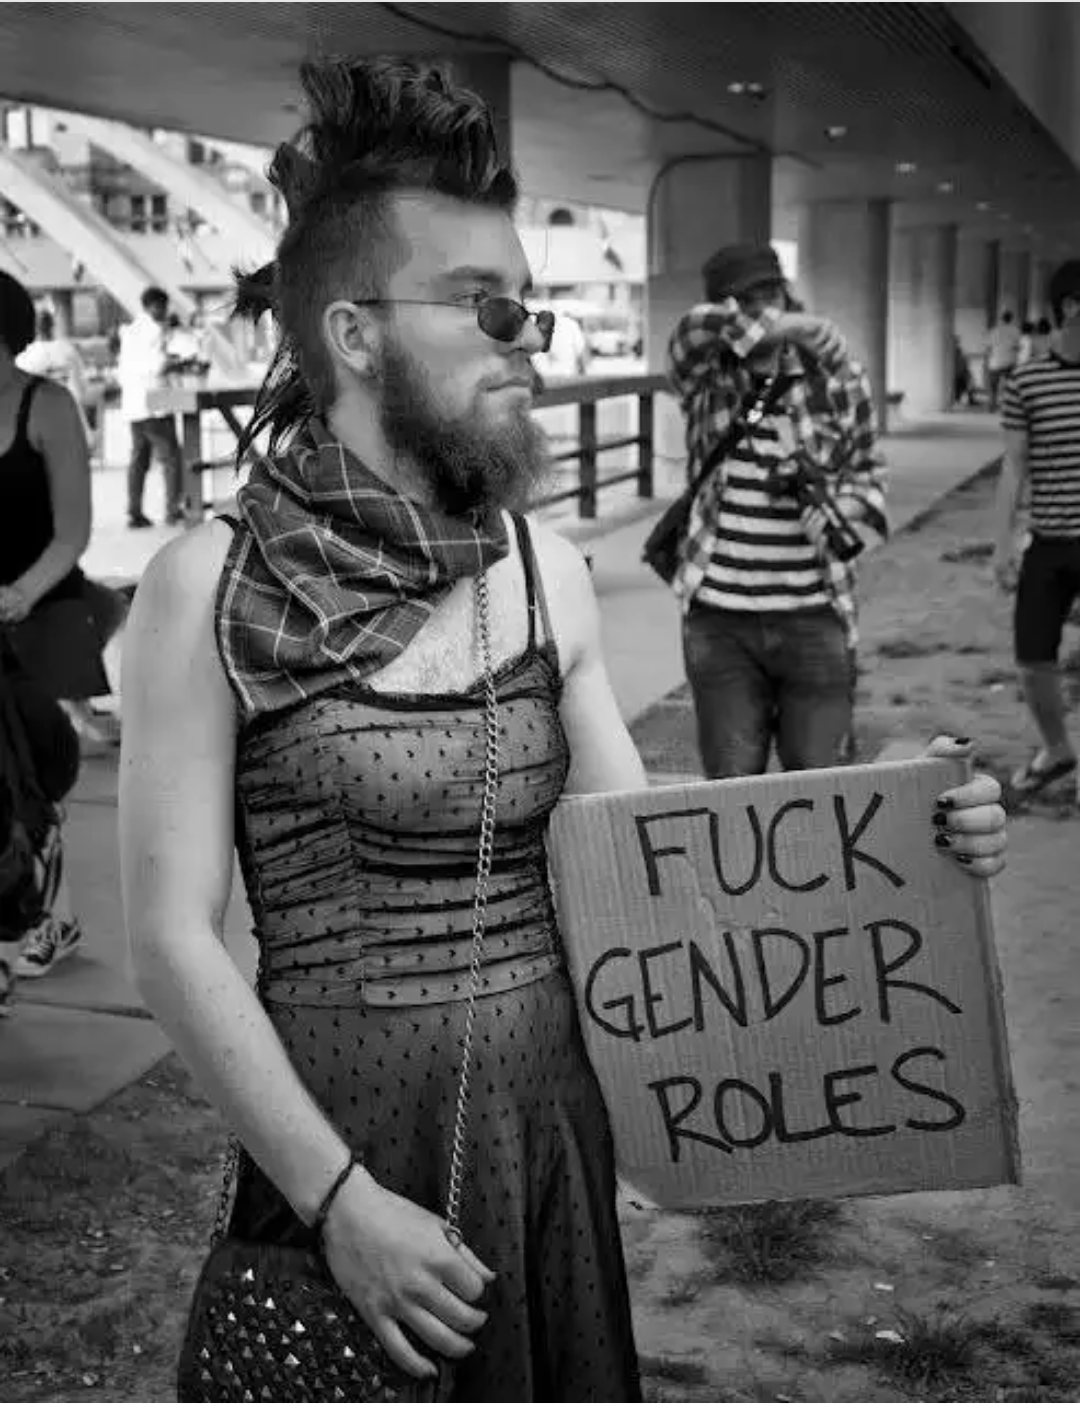 Genderfuck